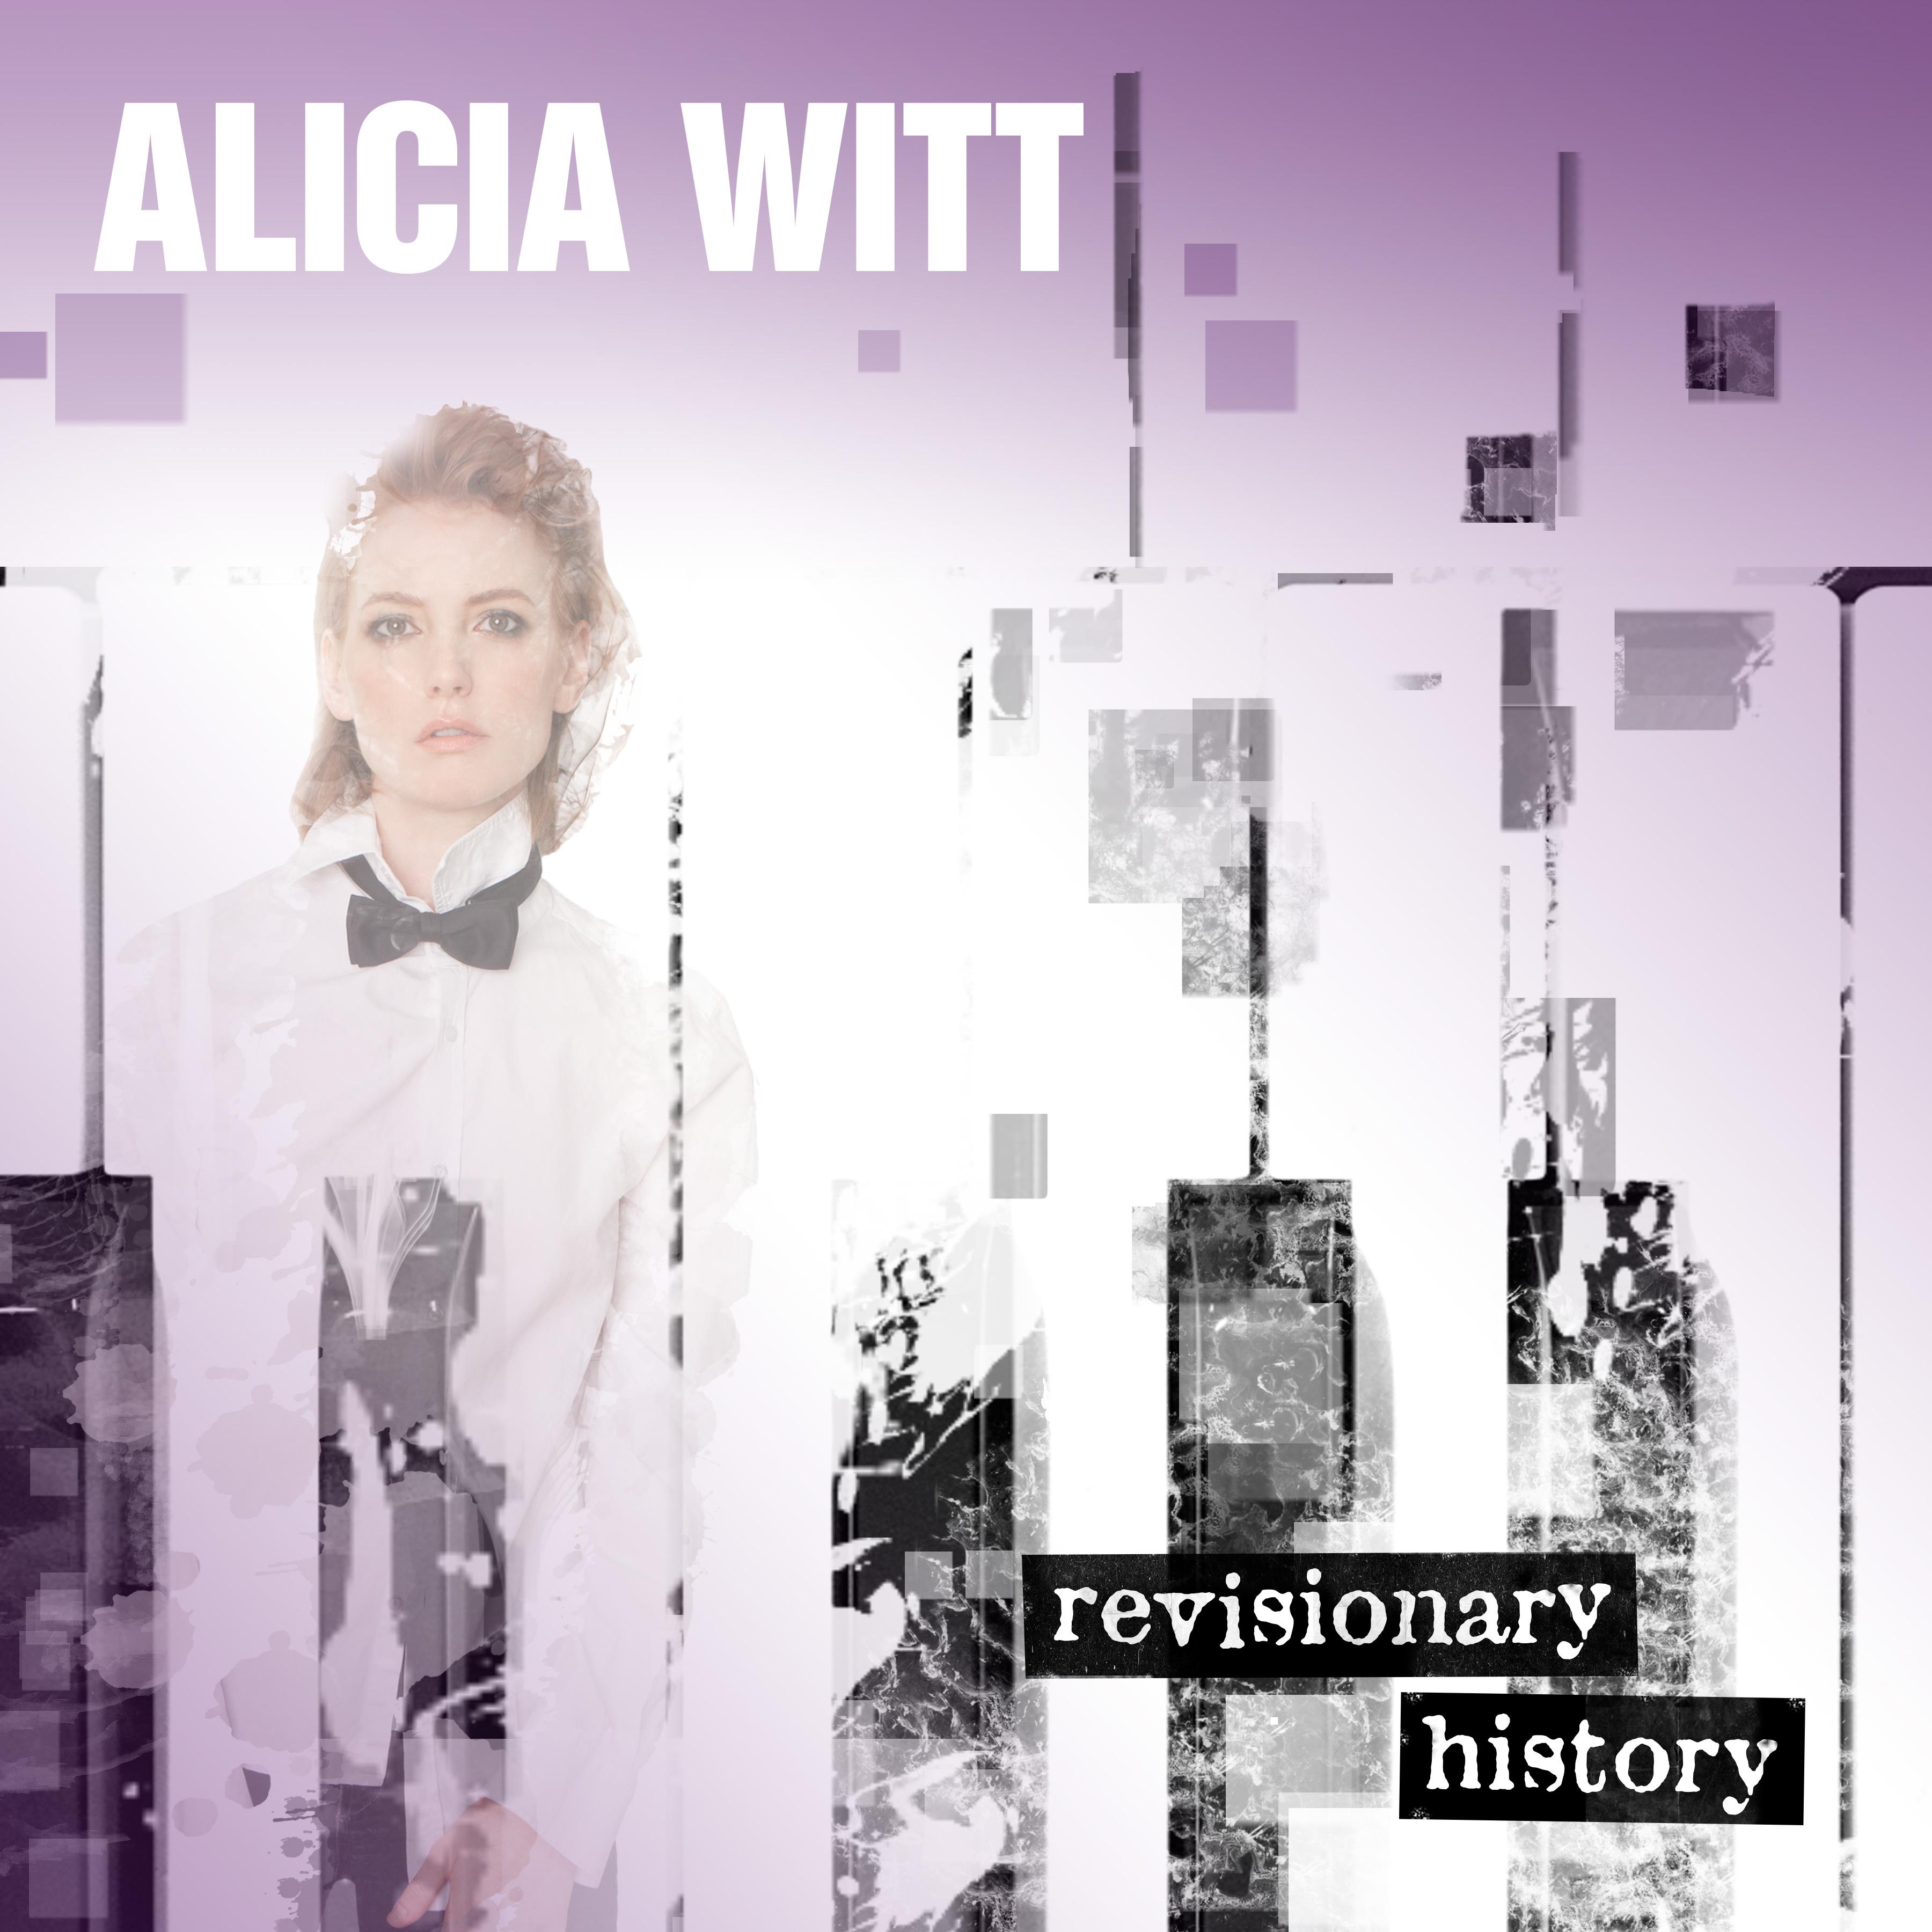 Alicia Witt - Revisionary Hero album art